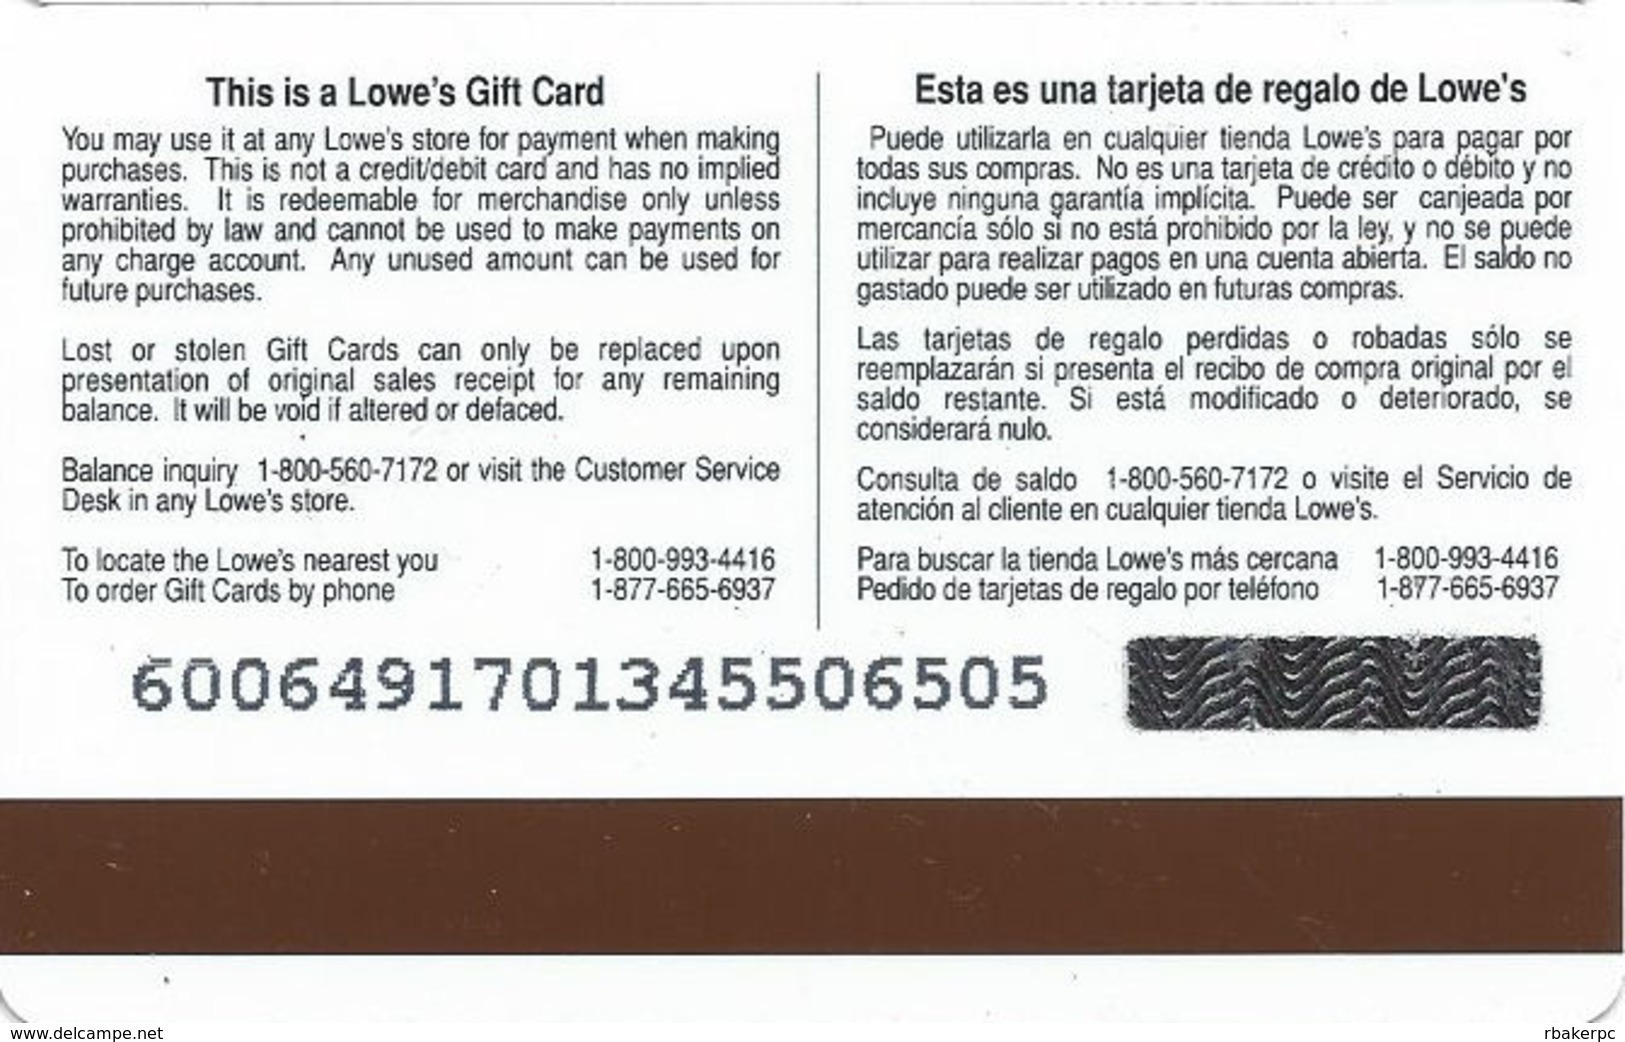 Lowes NCAA Gift Card - Cincinnati Bearcats - Gift Cards